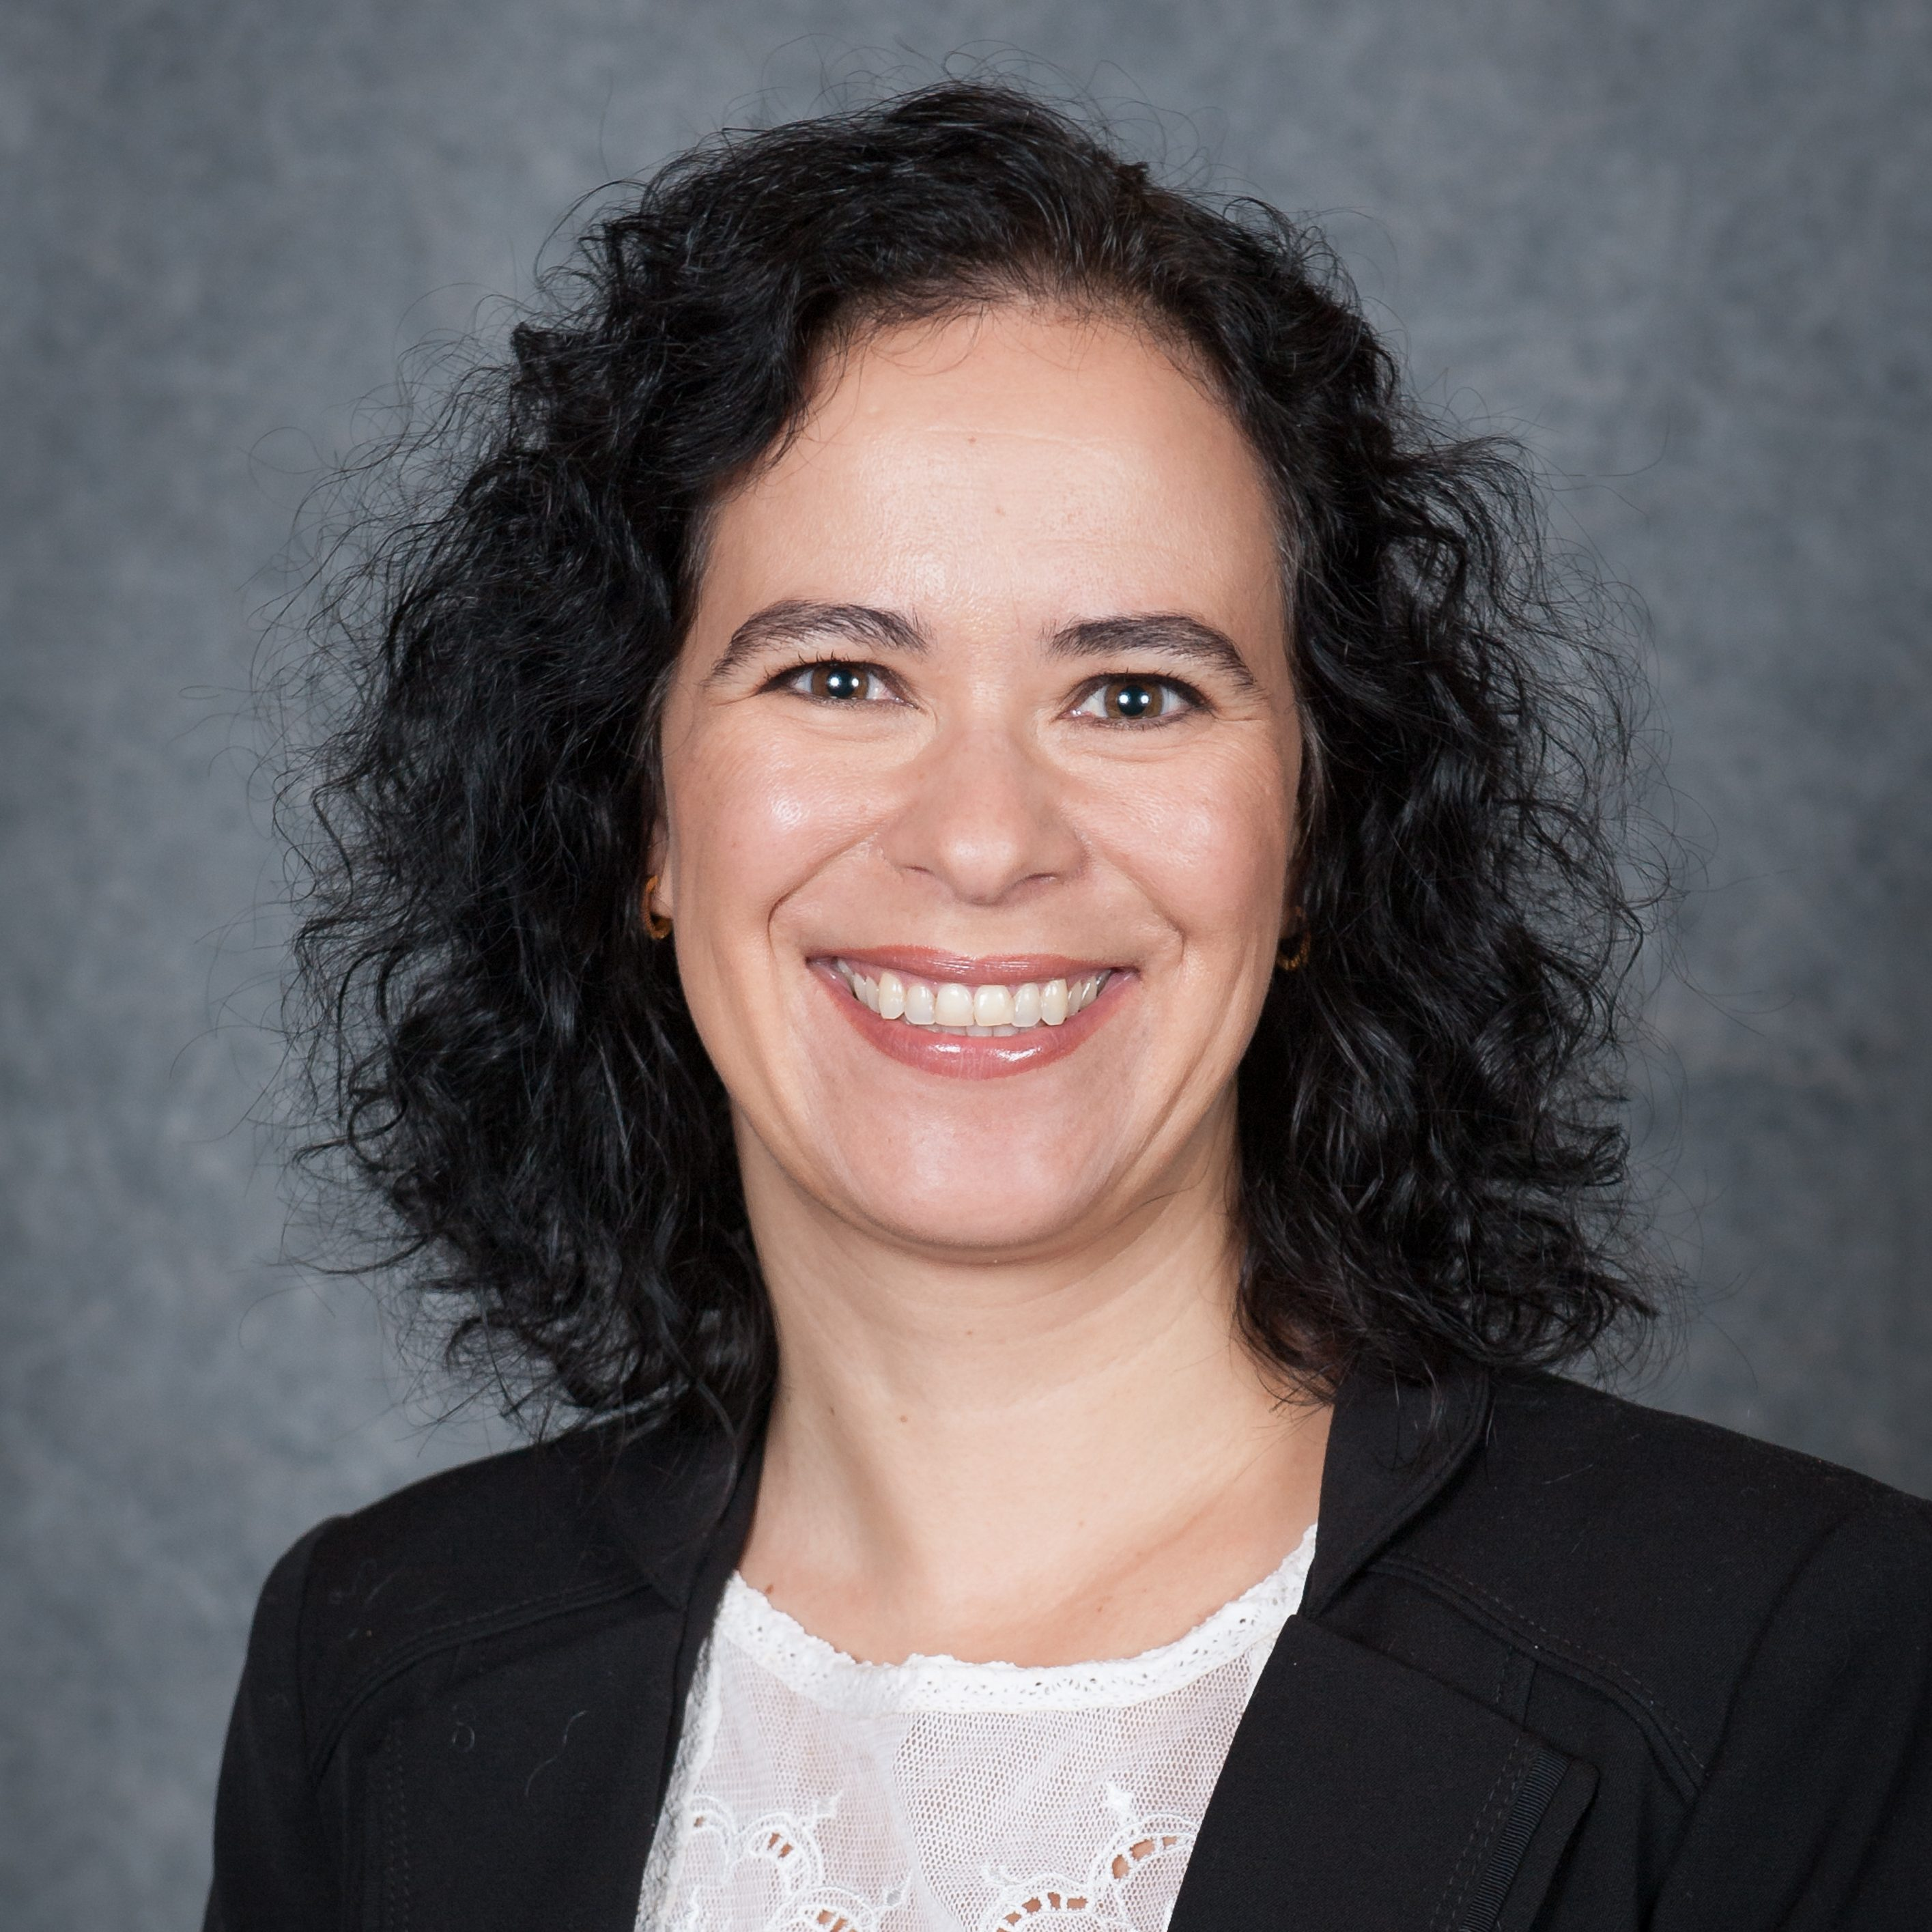 Sandra Mortal